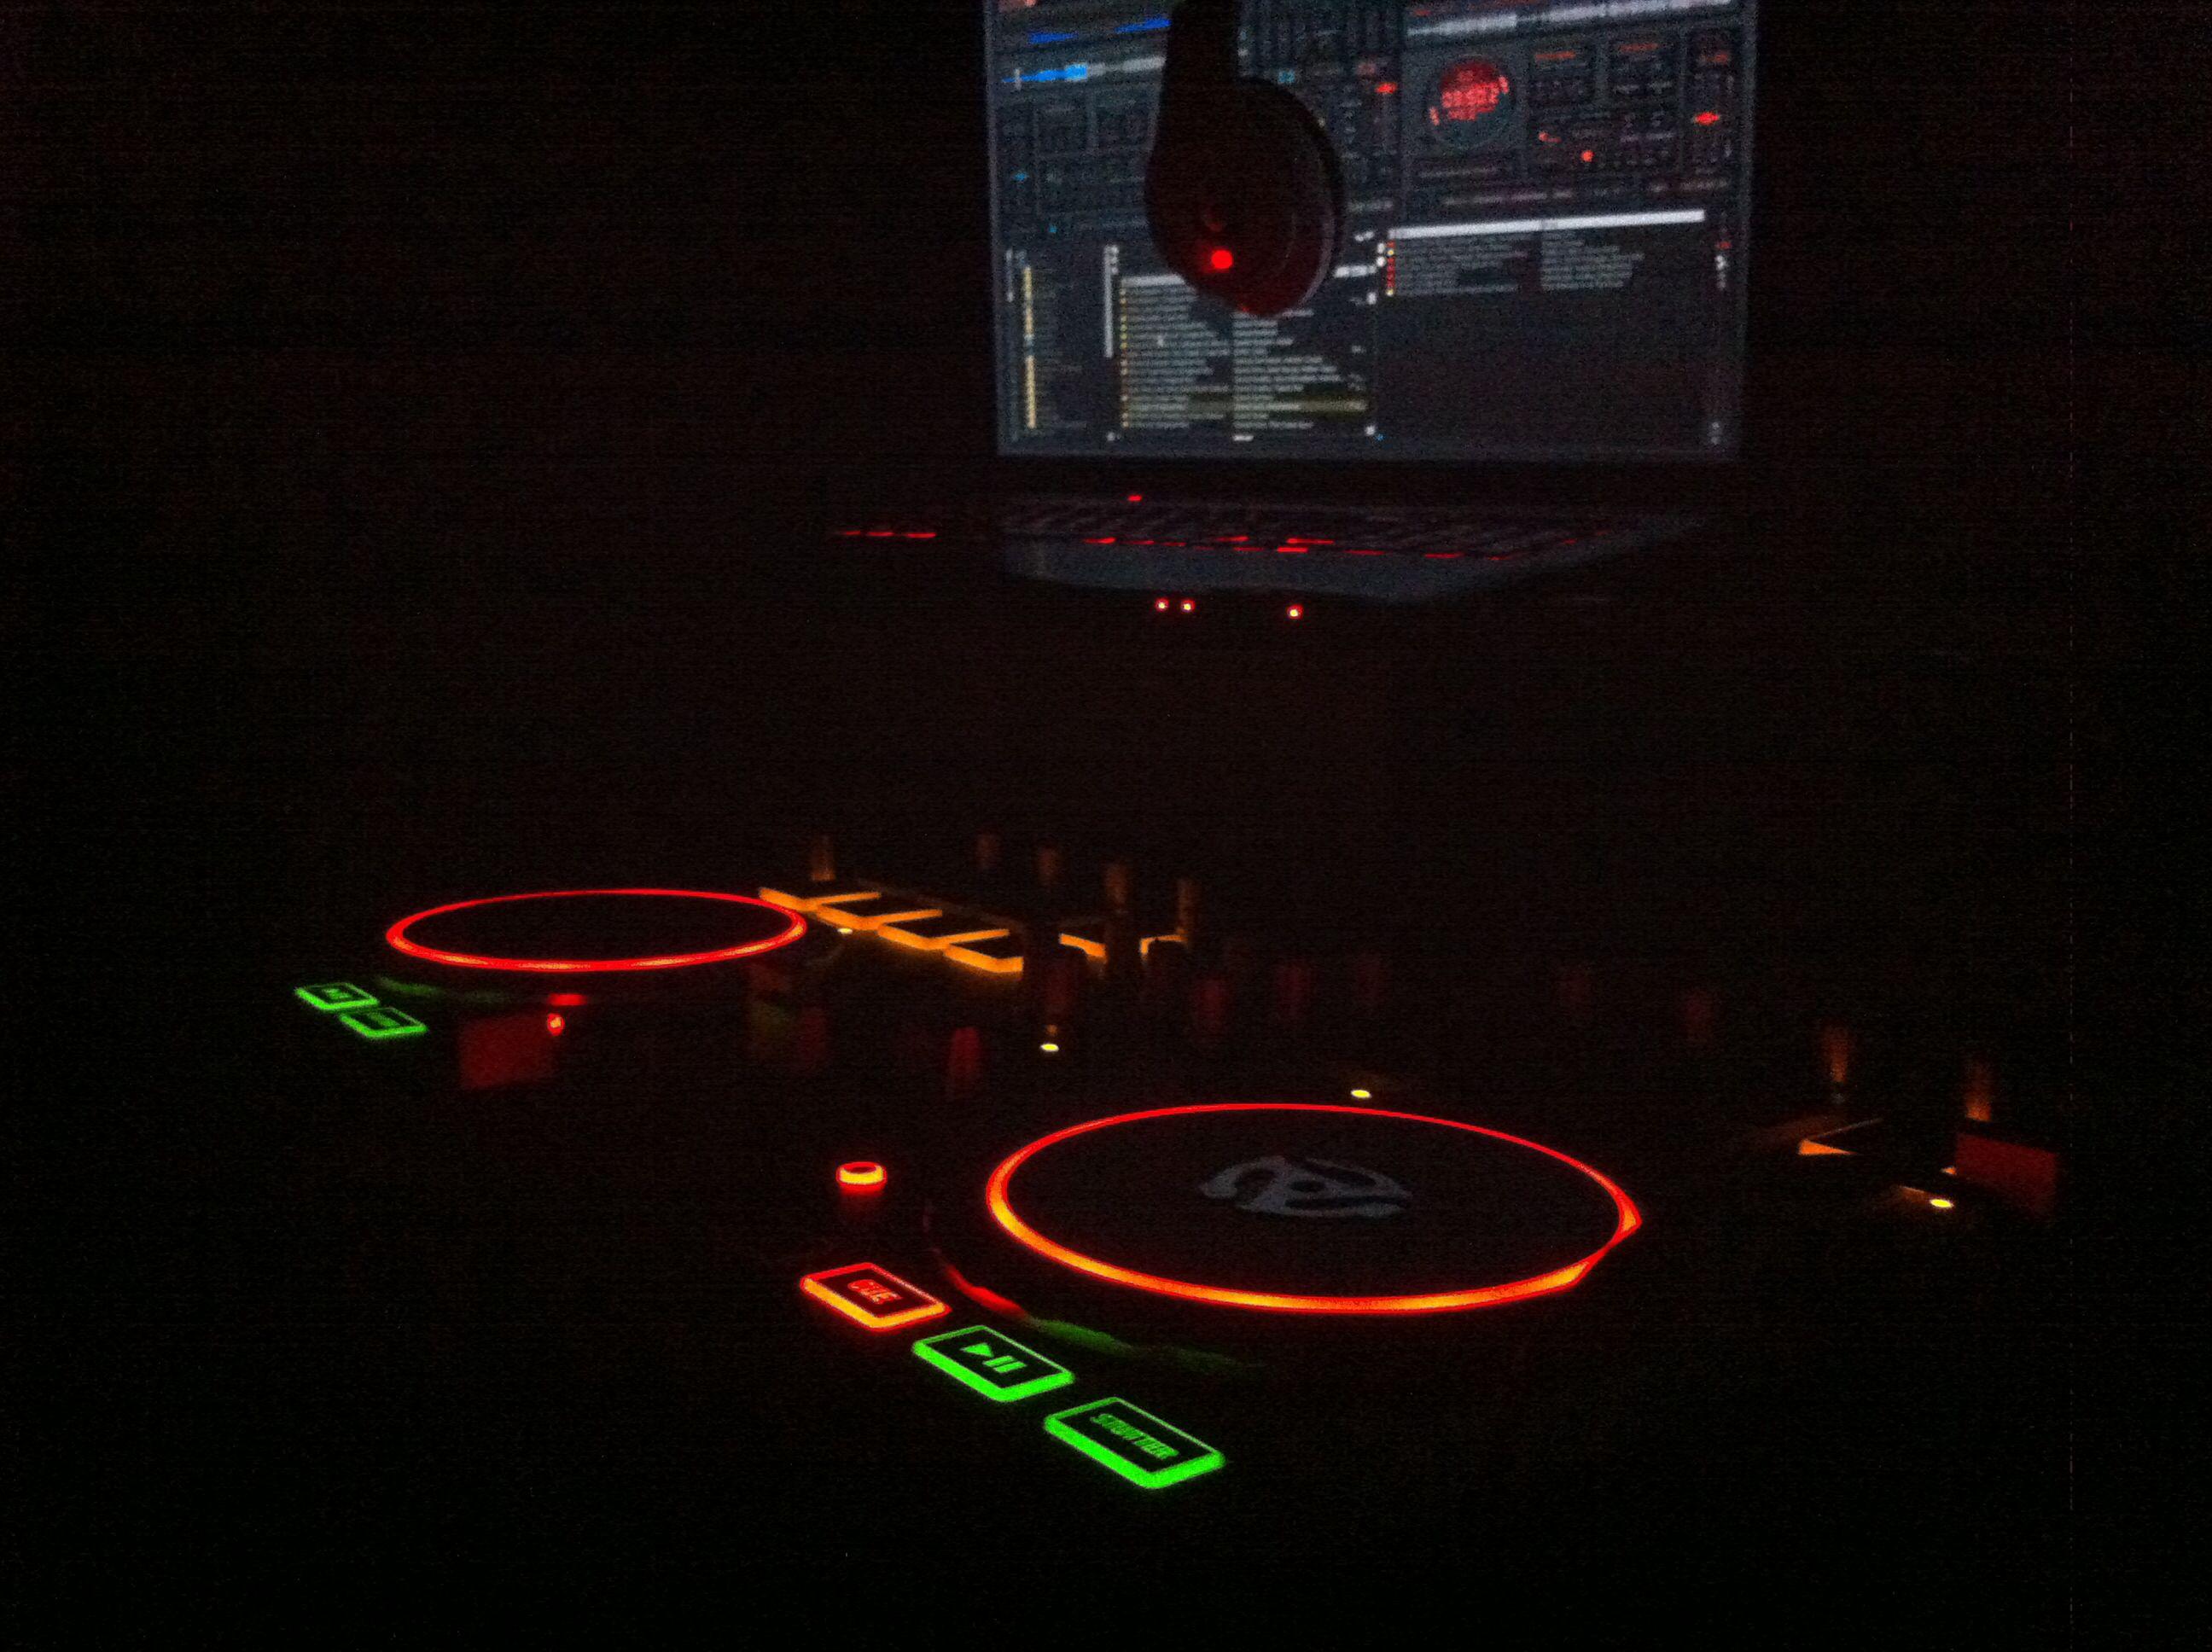 Numark Mixtrack Pro Ii Edm Numark Dj Music Serato With Images Electronic Dance Music Dance Music Edm